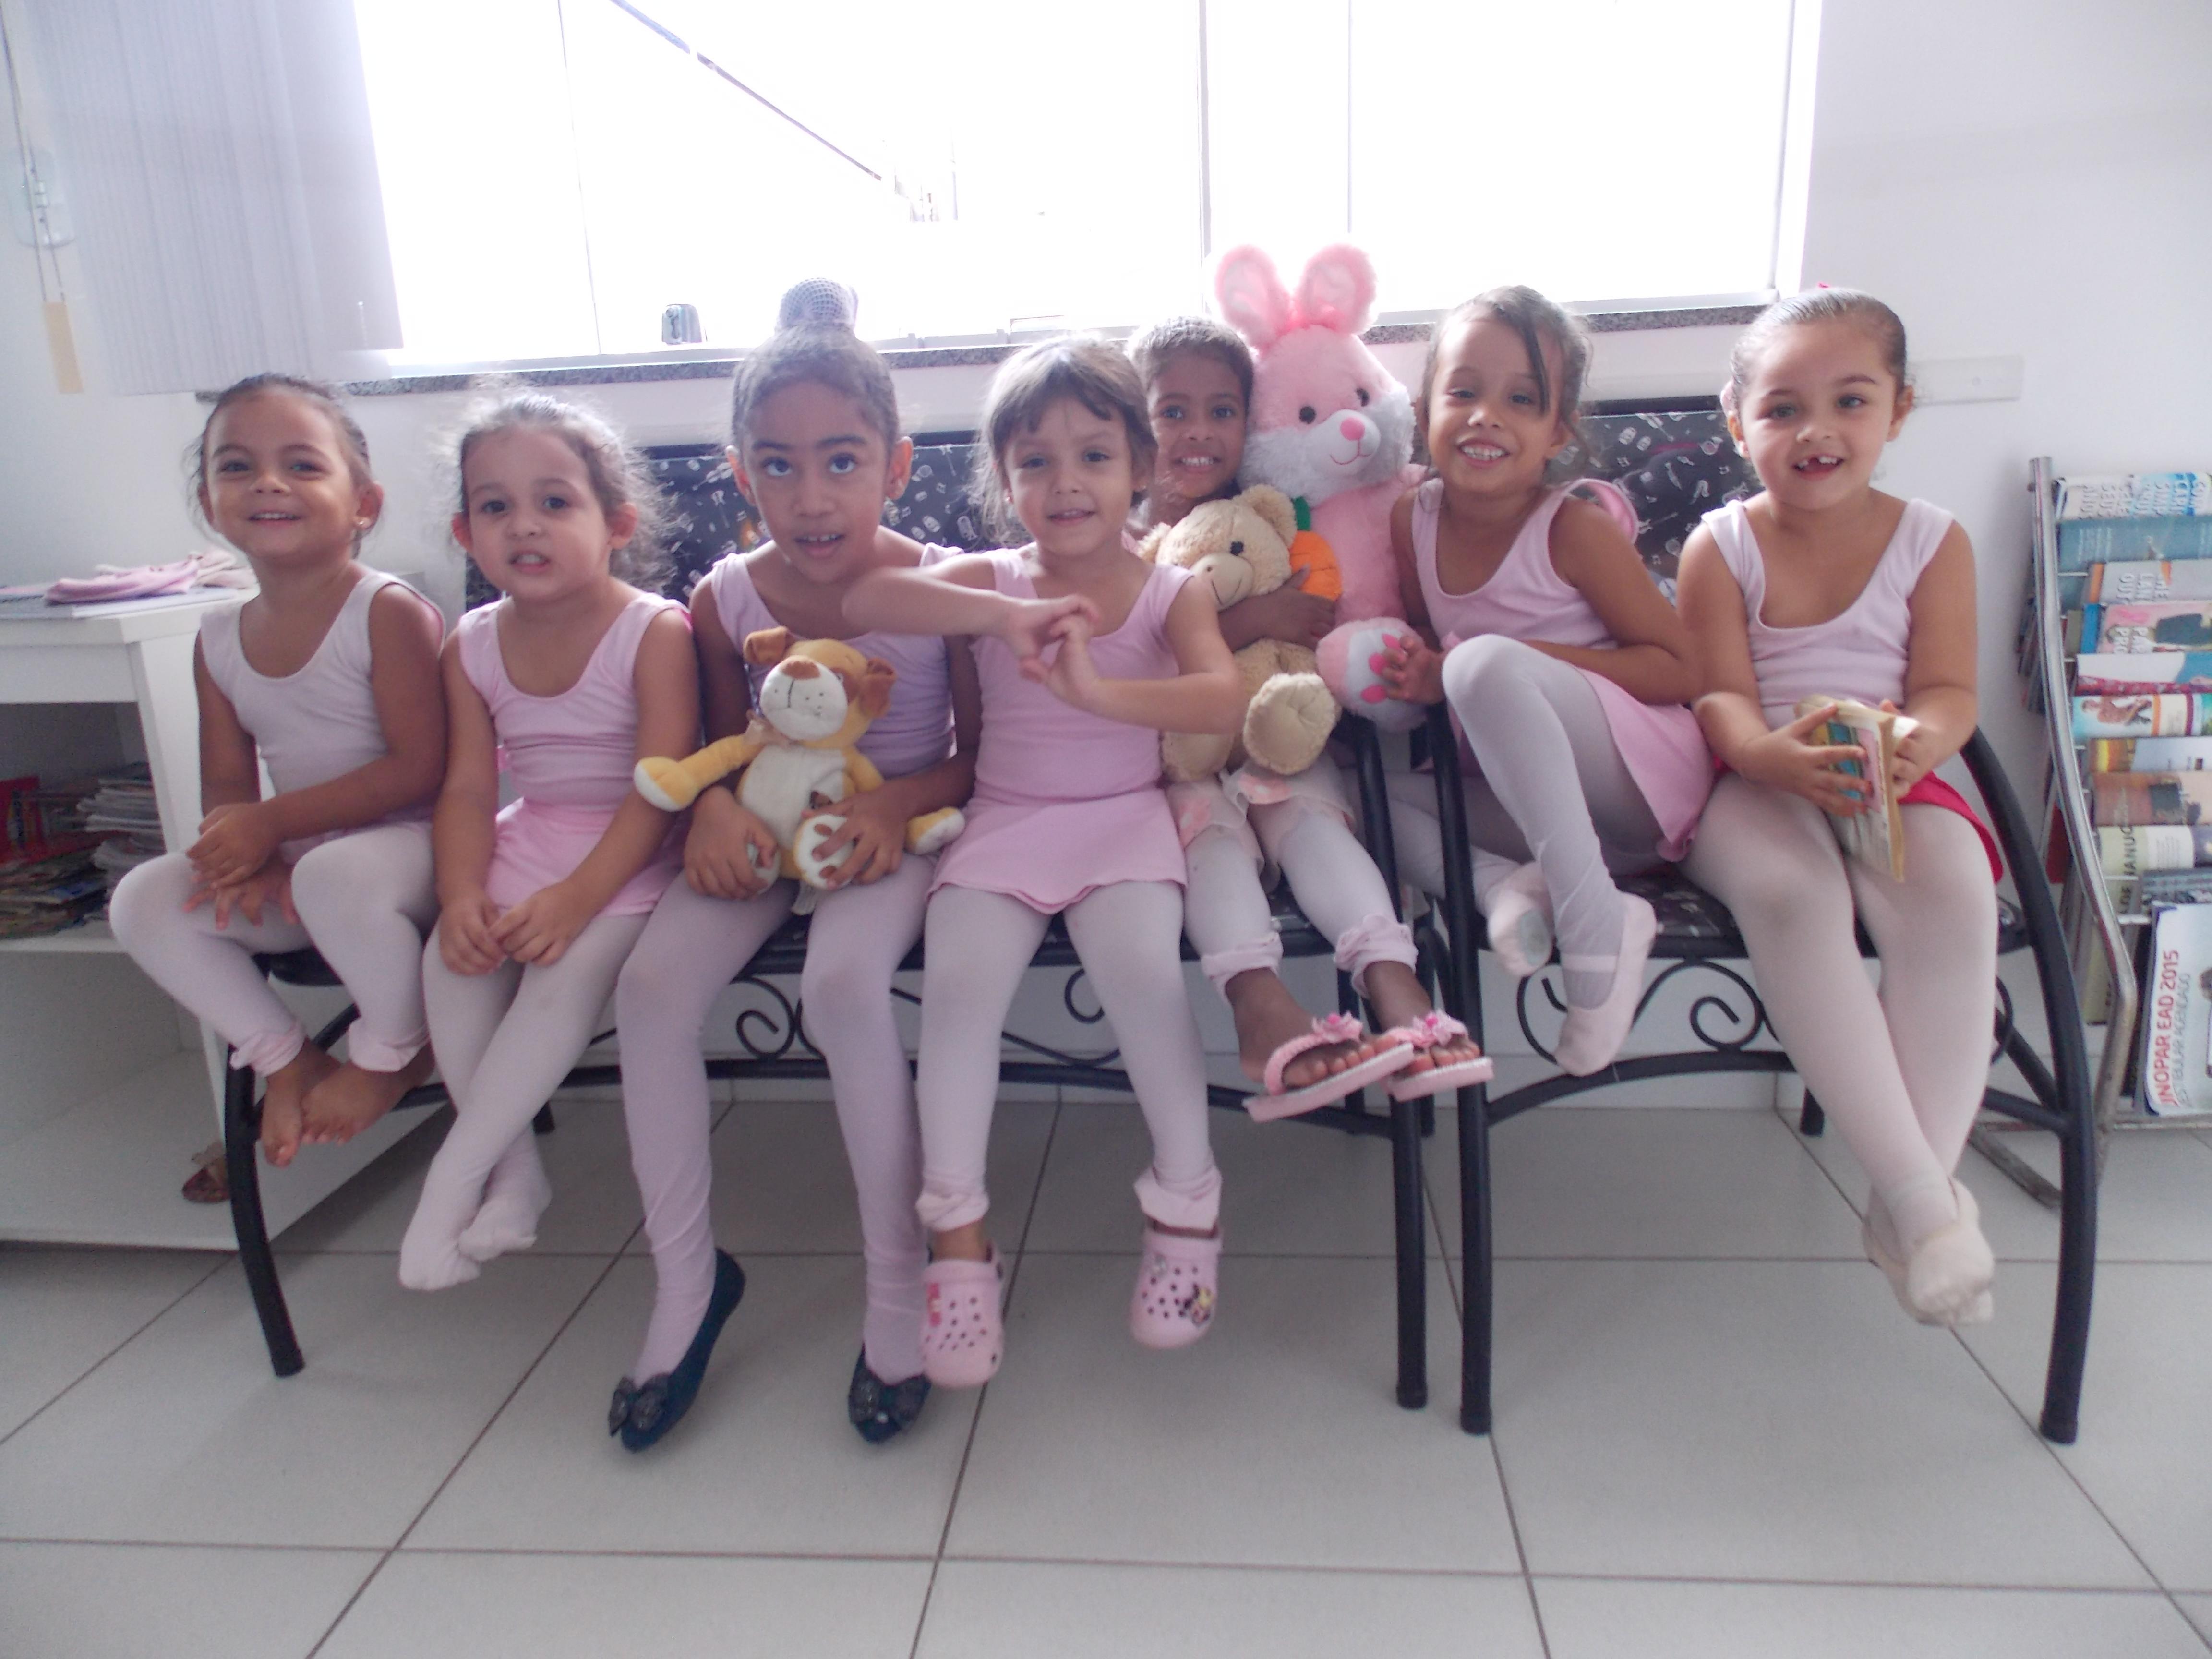 Nossas alunas do Ballet Baby